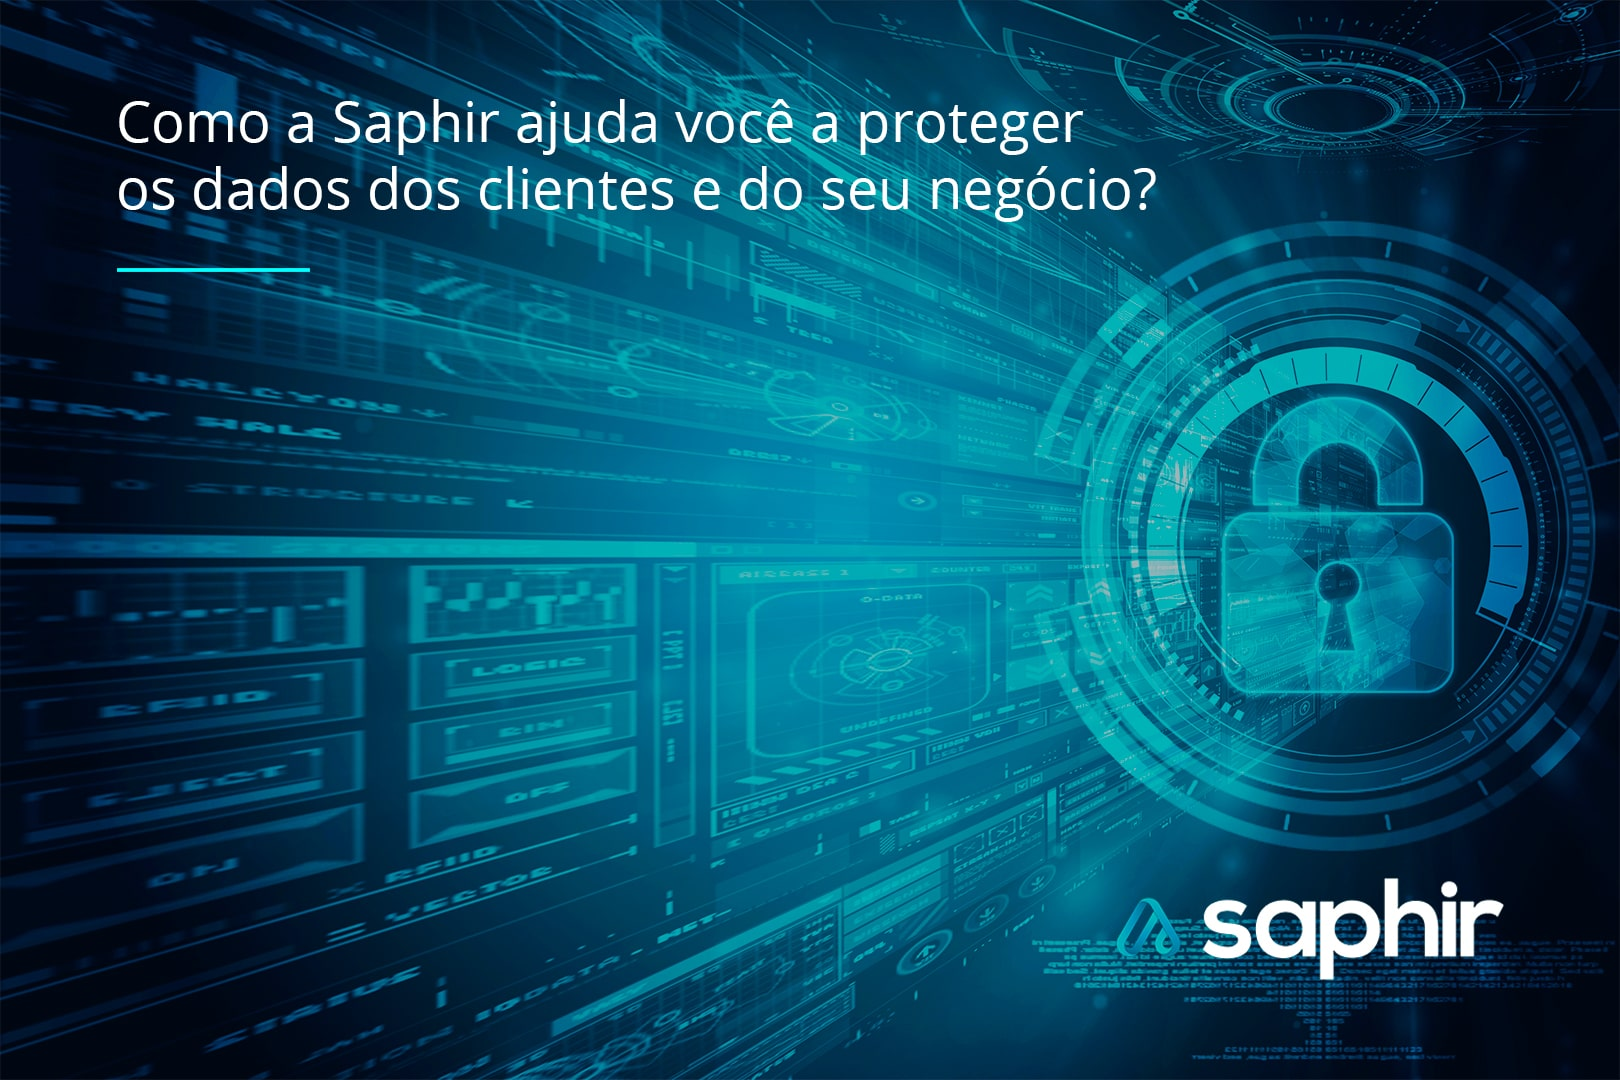 proteger os dados dos clientes